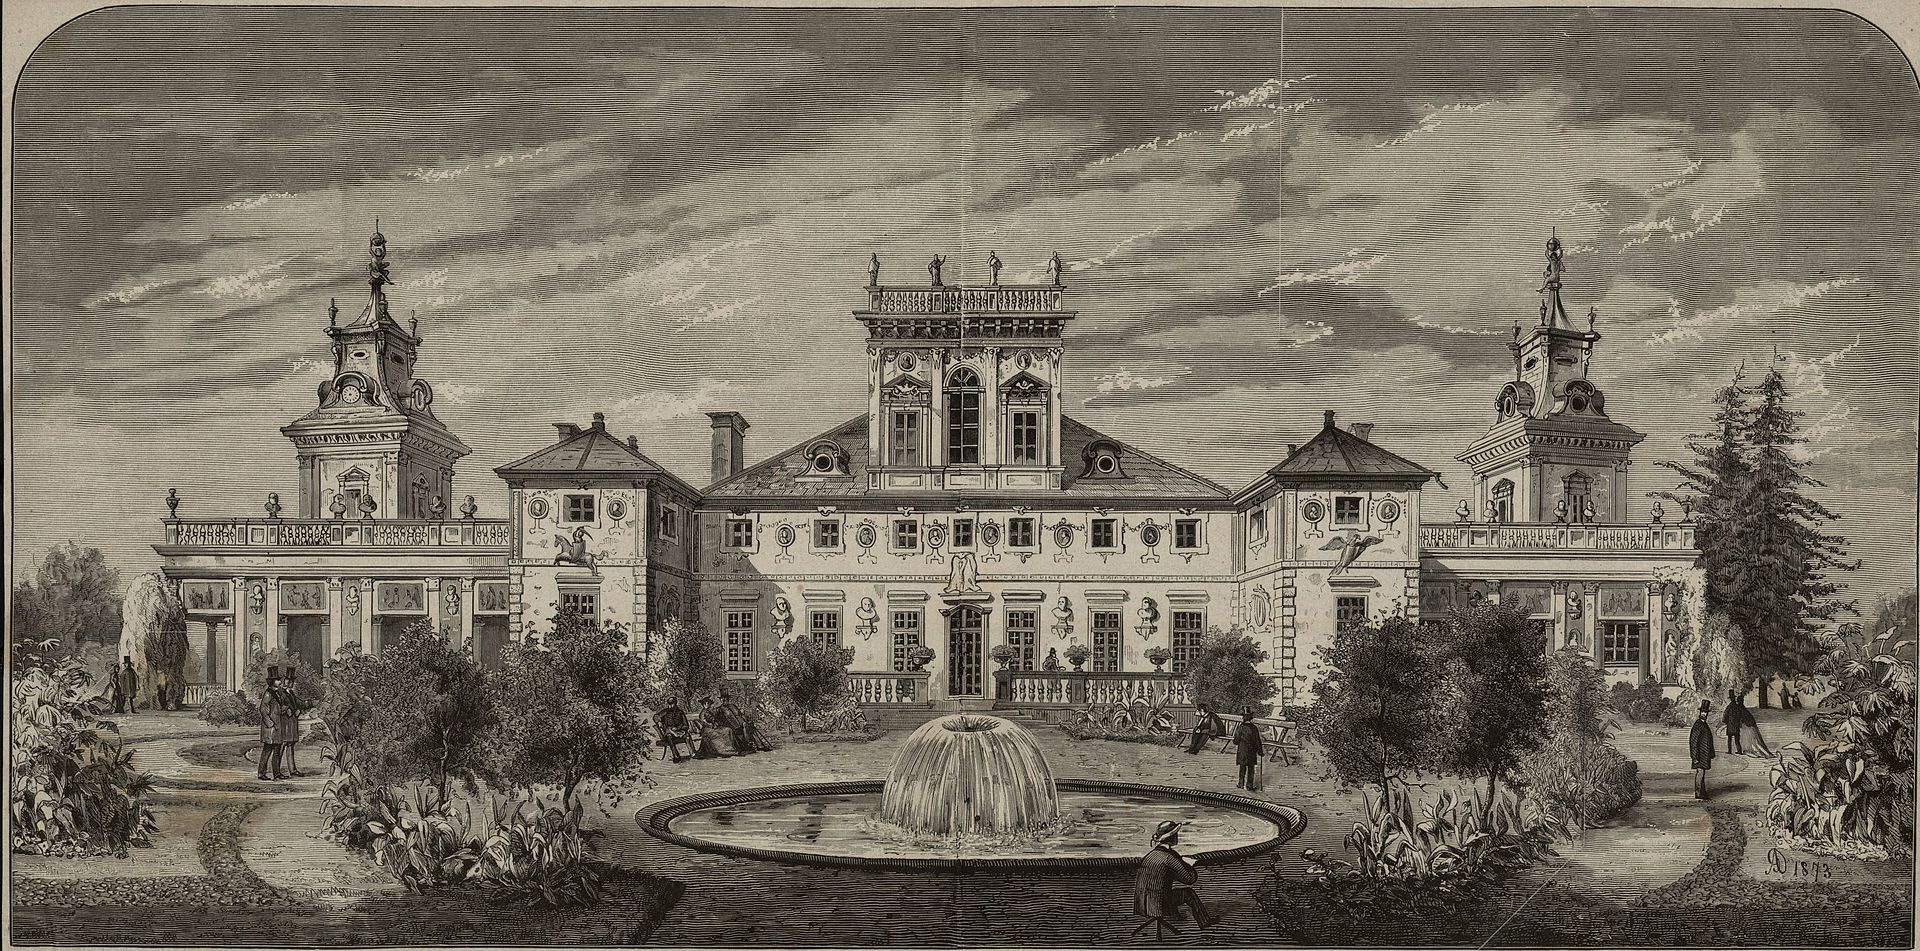 Михал Ключевский Pałac w Wilanowie.jpg